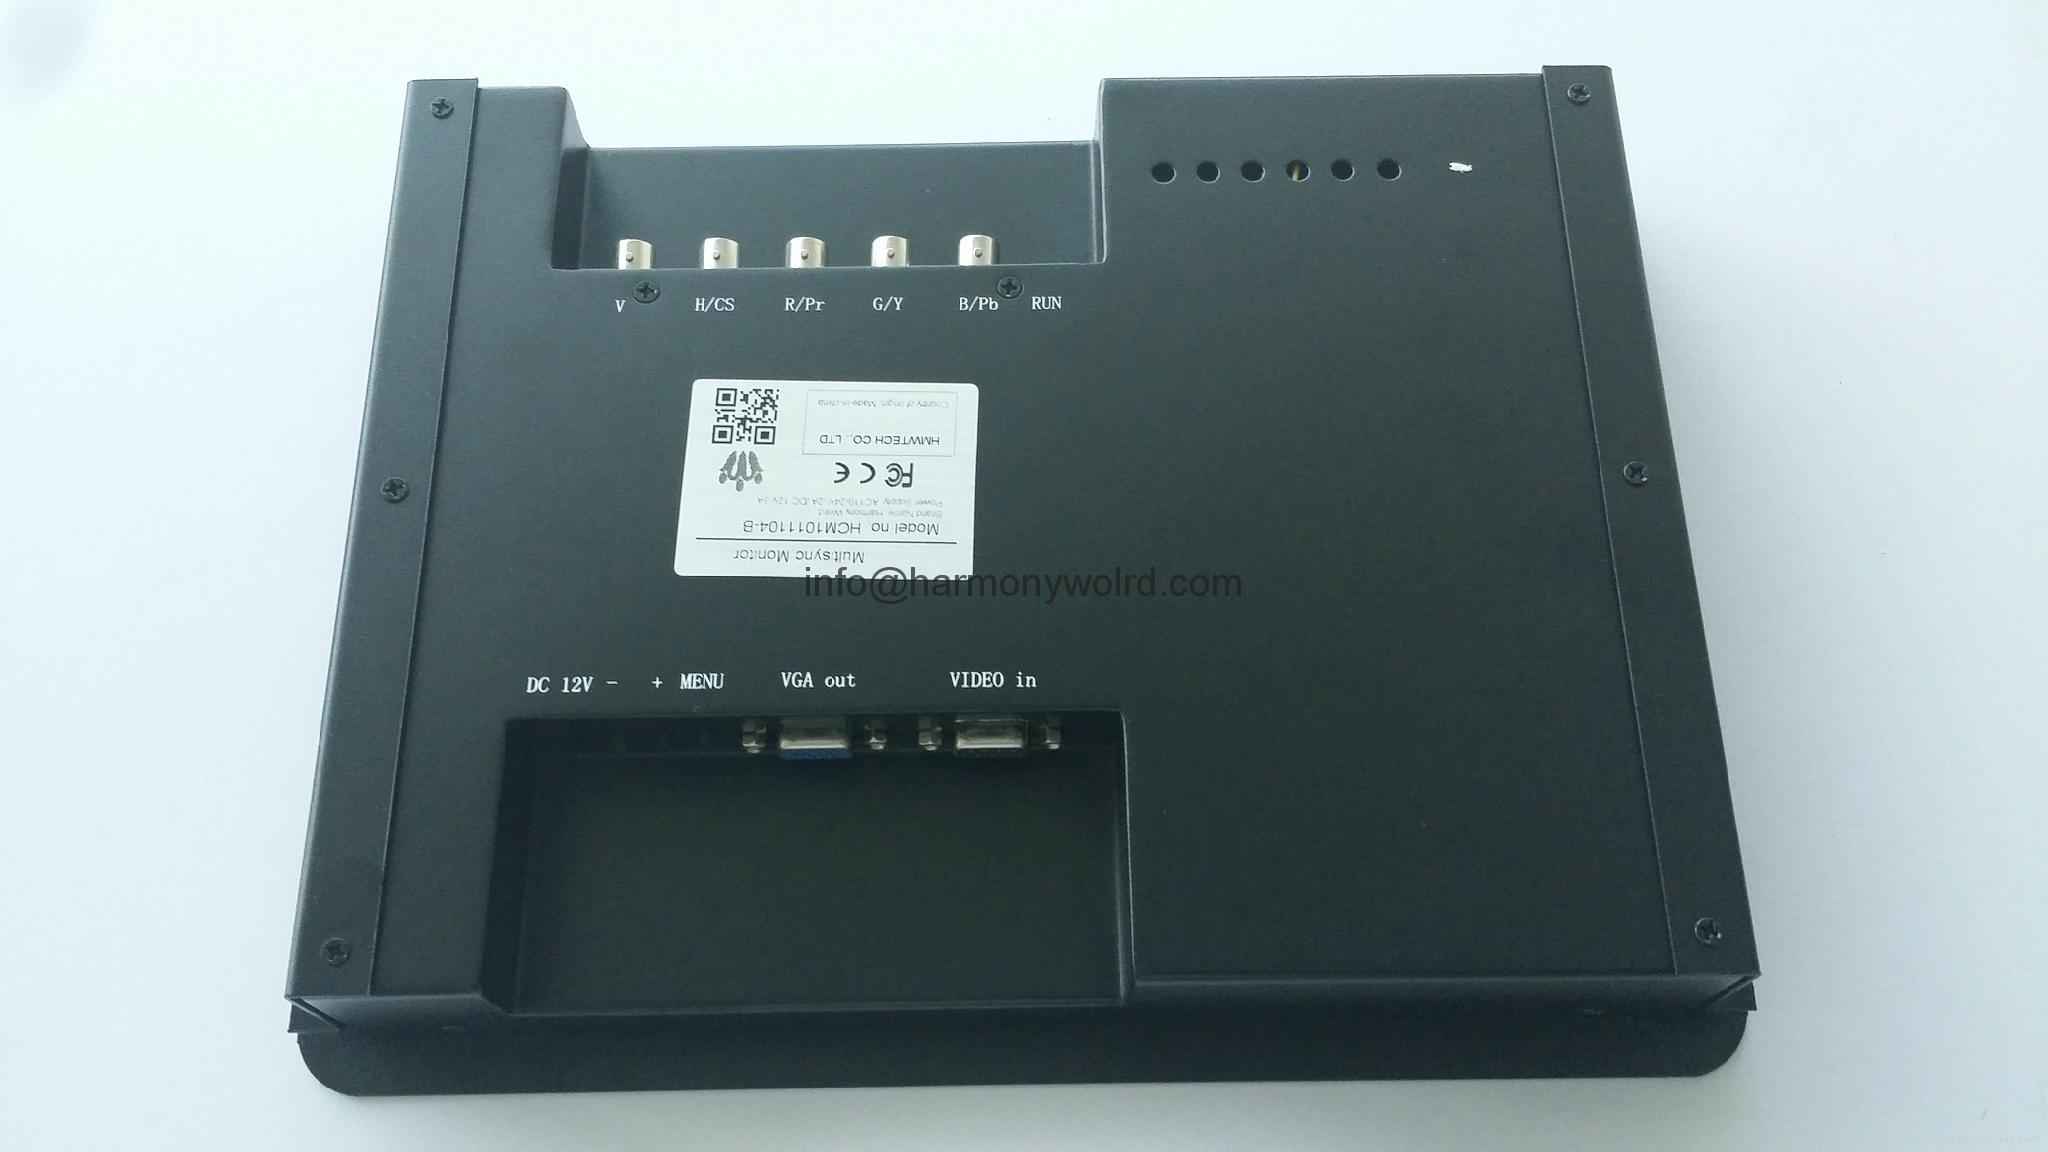 QDM-1220AAE-713 LCD Upgrade QDM-1220AAE-713 LCD 12 inch monitor  5